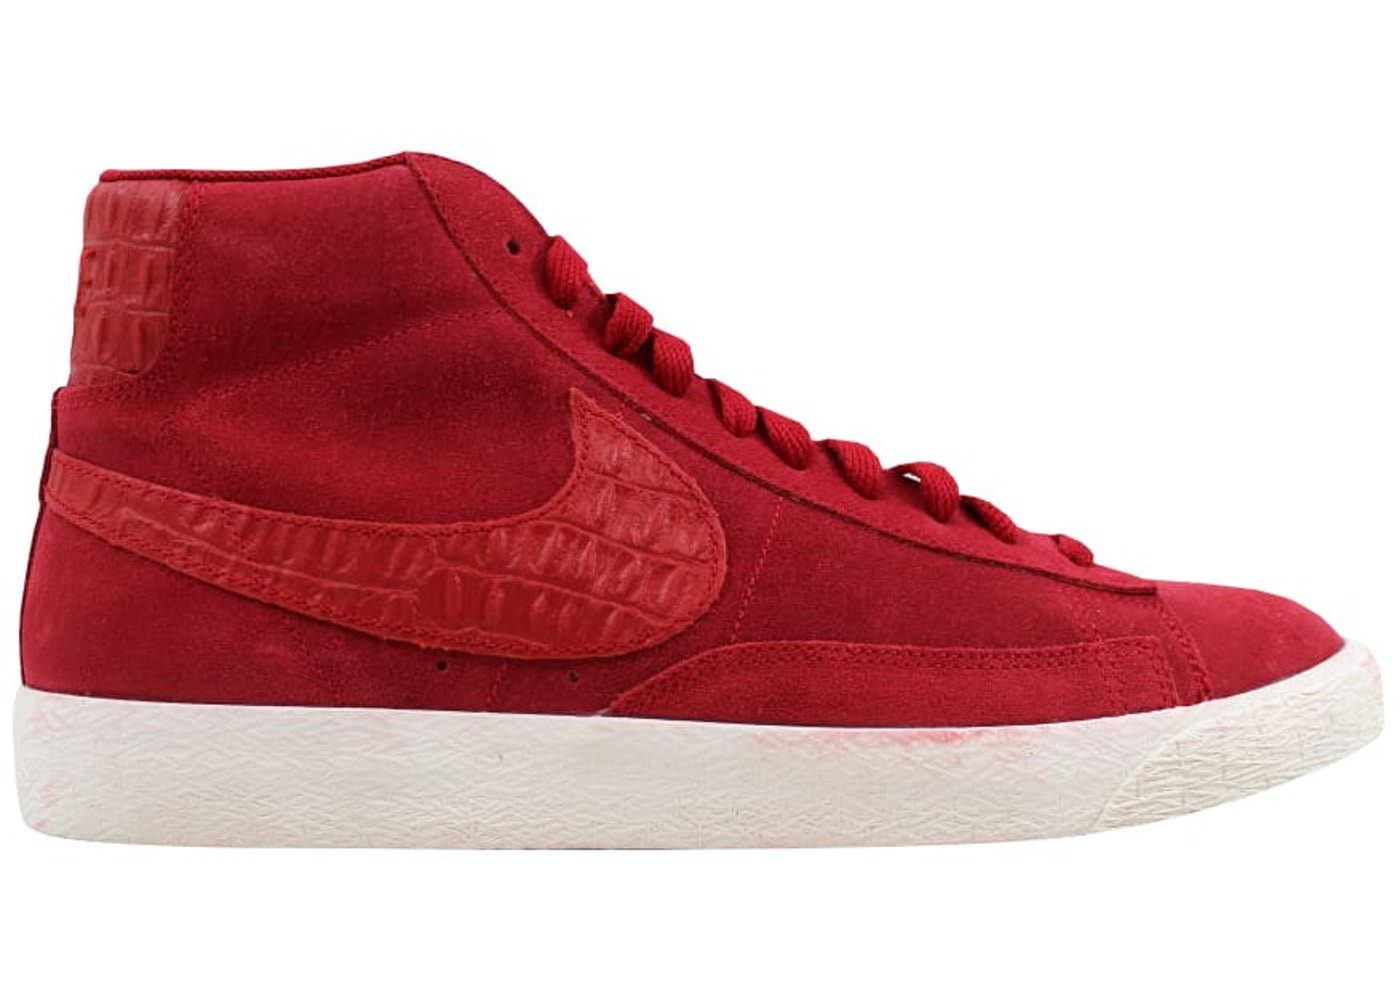 exquisite design autumn shoes sale online Nike Blazer Mid Premium Vintage Gym Red/Gym Red-Sail